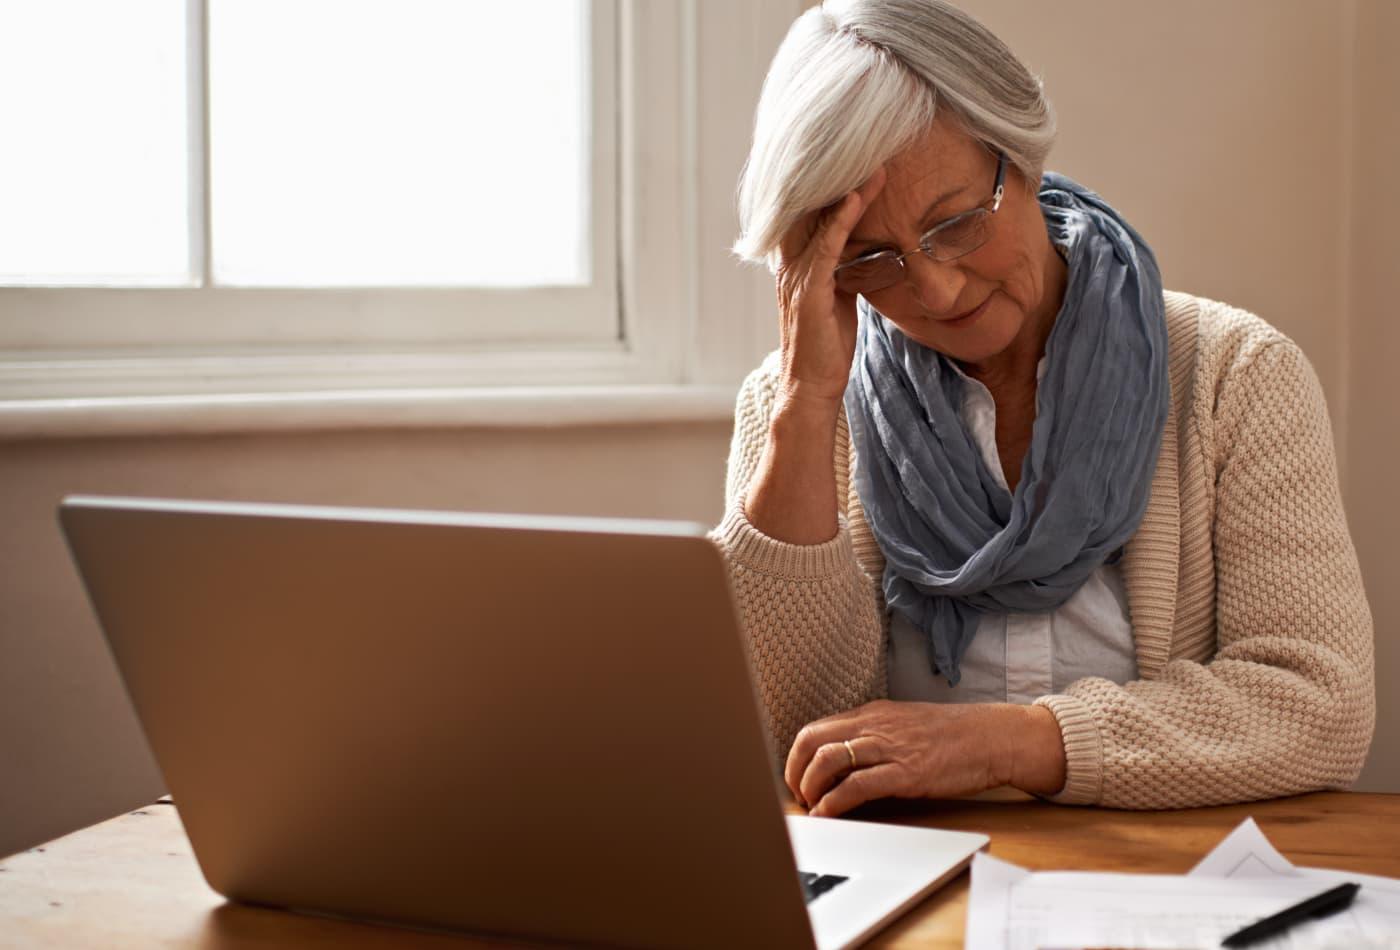 Here's why the coronavirus may clobber your retirement plans